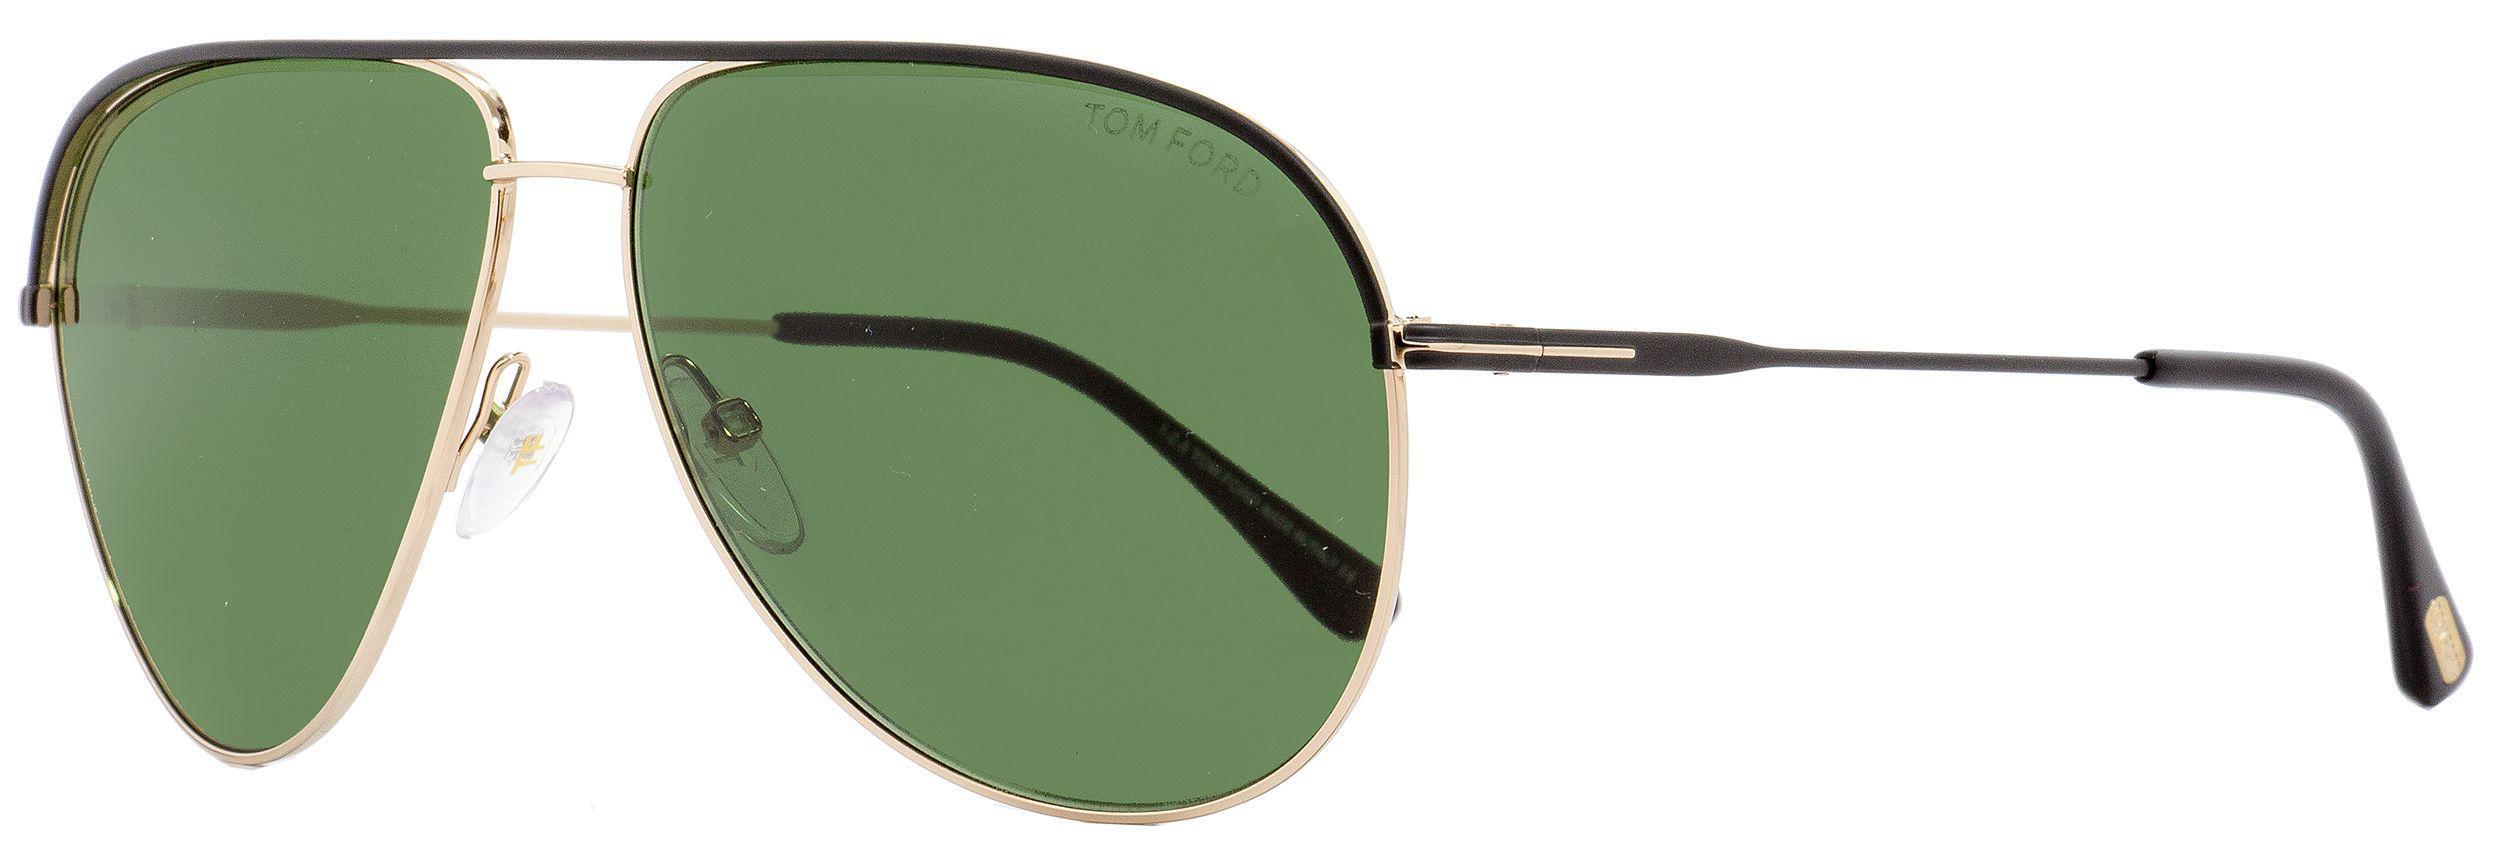 ae1b6bdfc2 Lyst - Tom Ford Aviator Sunglasses Tf466 Erin 05n Black gold 61mm ...